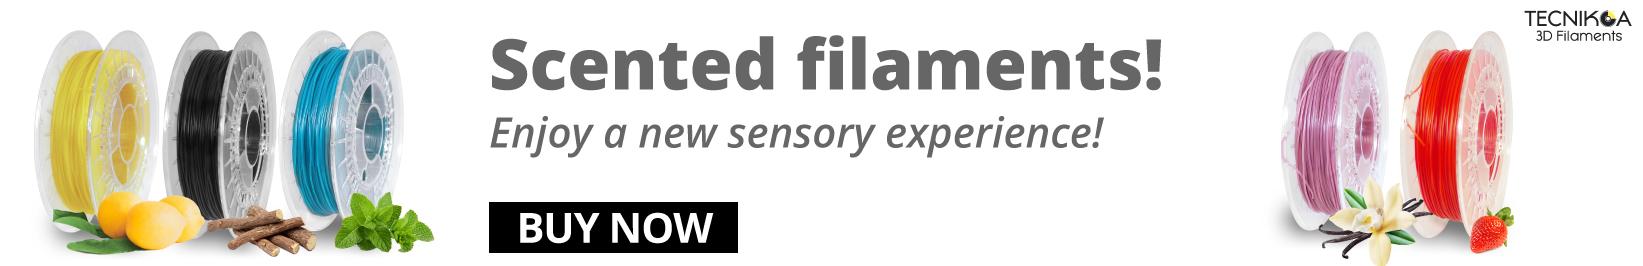 Filafresh filaments, scented TPU